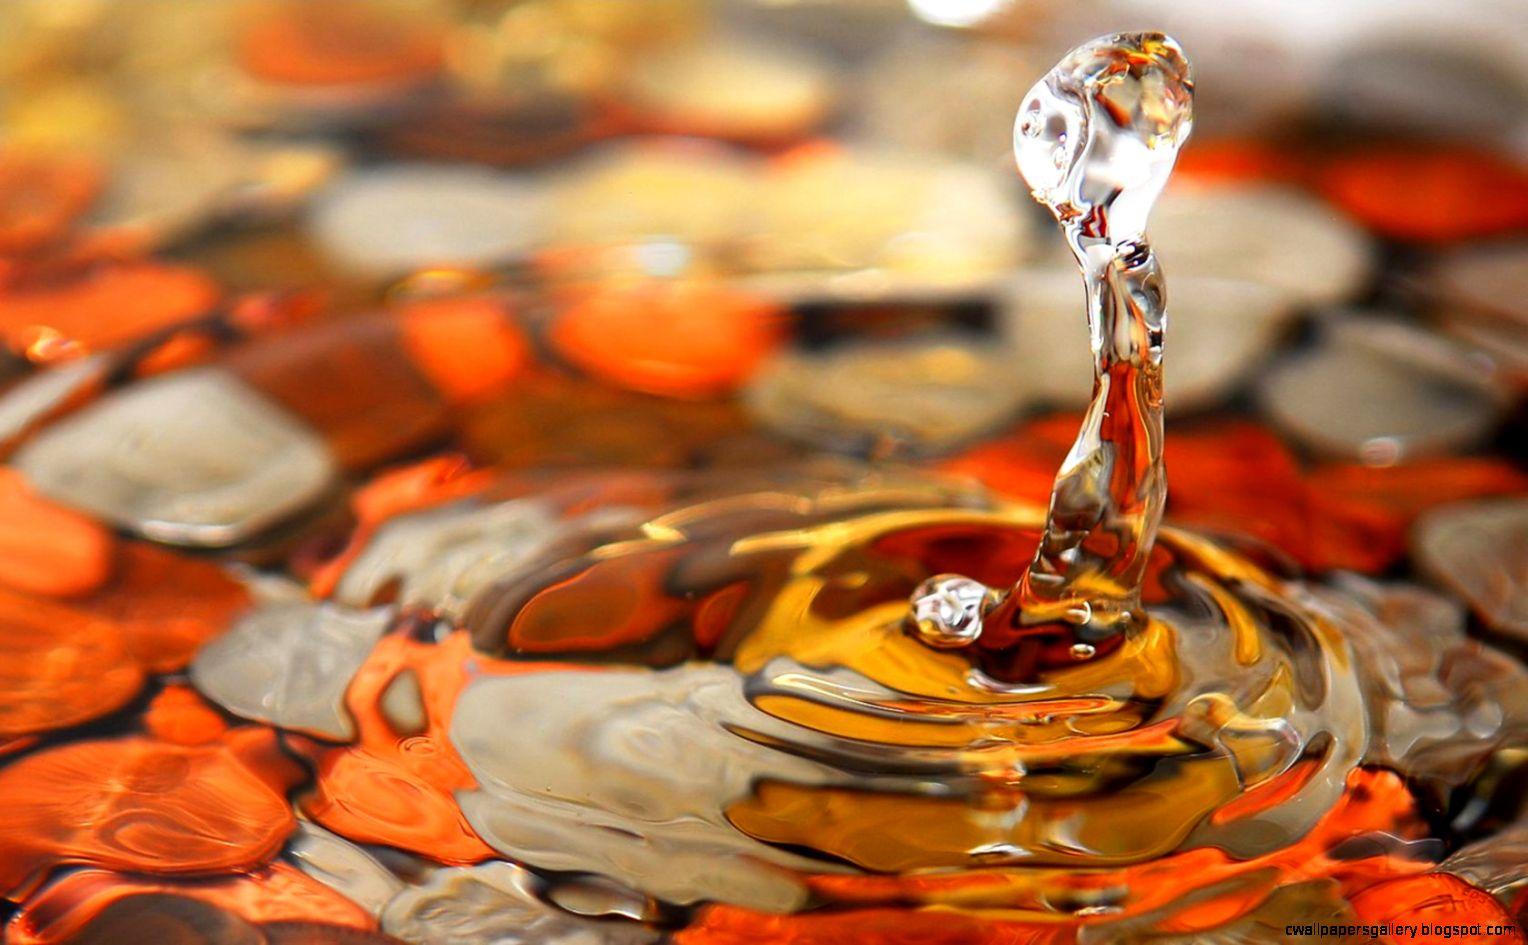 More Beautiful Water Drops Wallpaper  FLgrx Graphics